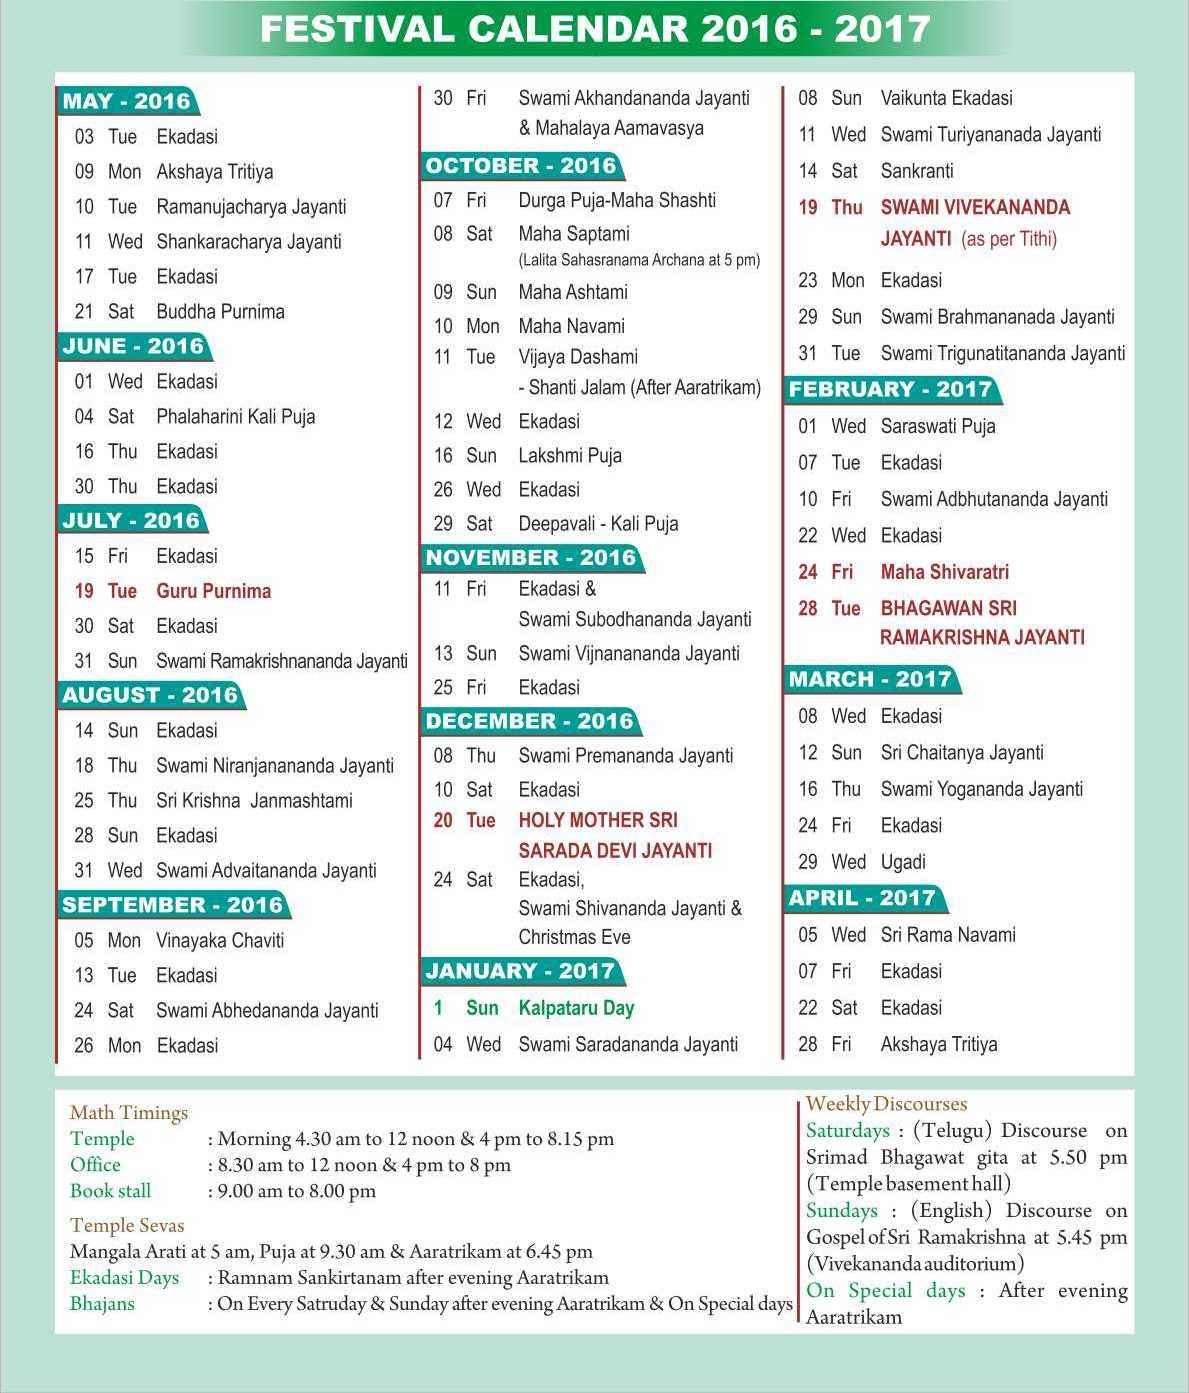 Calendar Festival : Barbados crop over festival full calendar of events mep